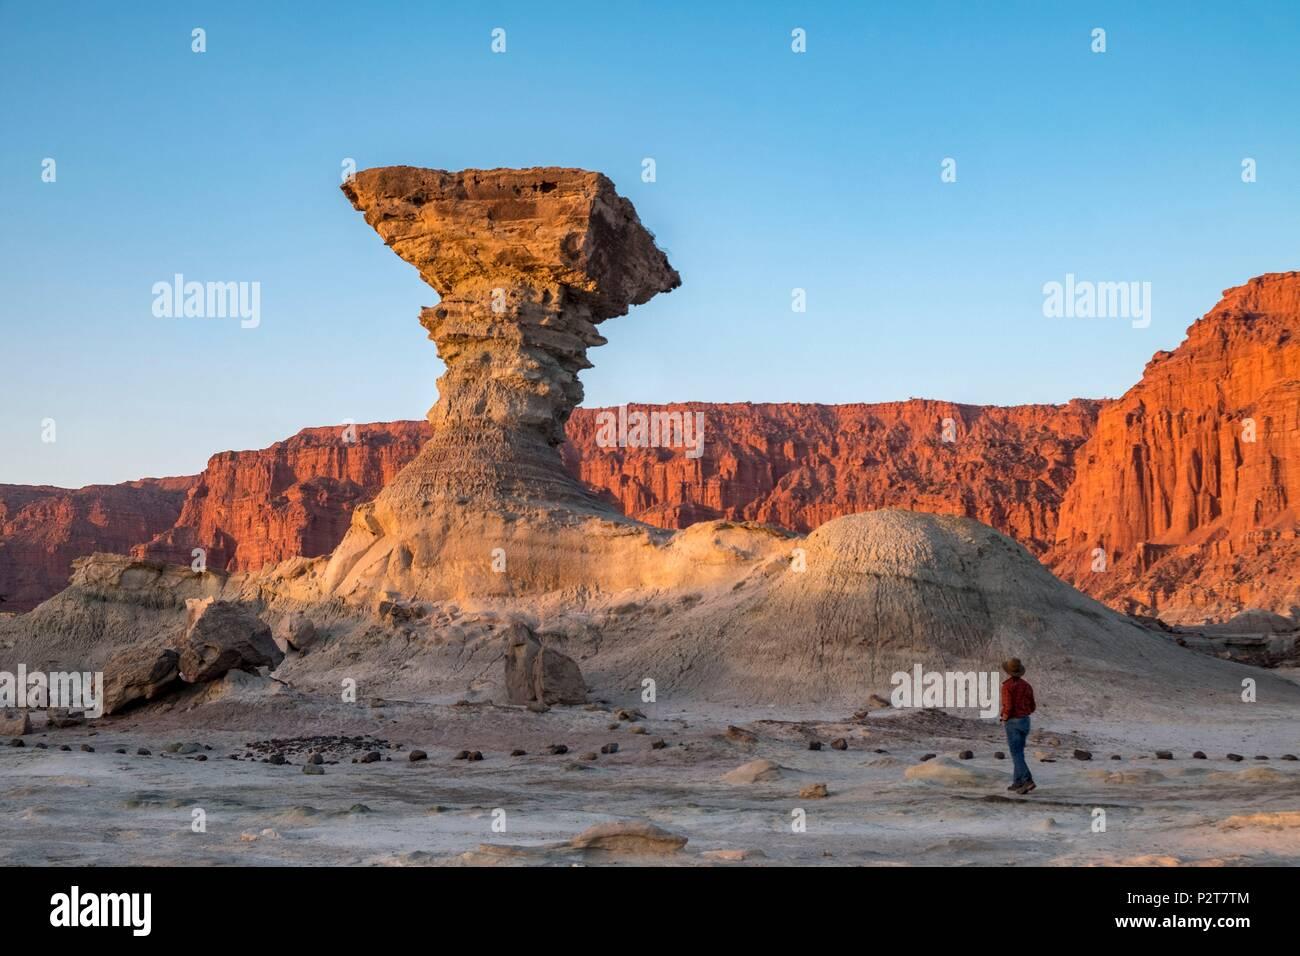 Argentina, San Juan Province, near San Augustin de Valle Fertil, Valle de la Luna, Moon Valley, Parque Ischigualasto listed as World Heritage by UNESCO, Pillar Rock, Hongo - Stock Image